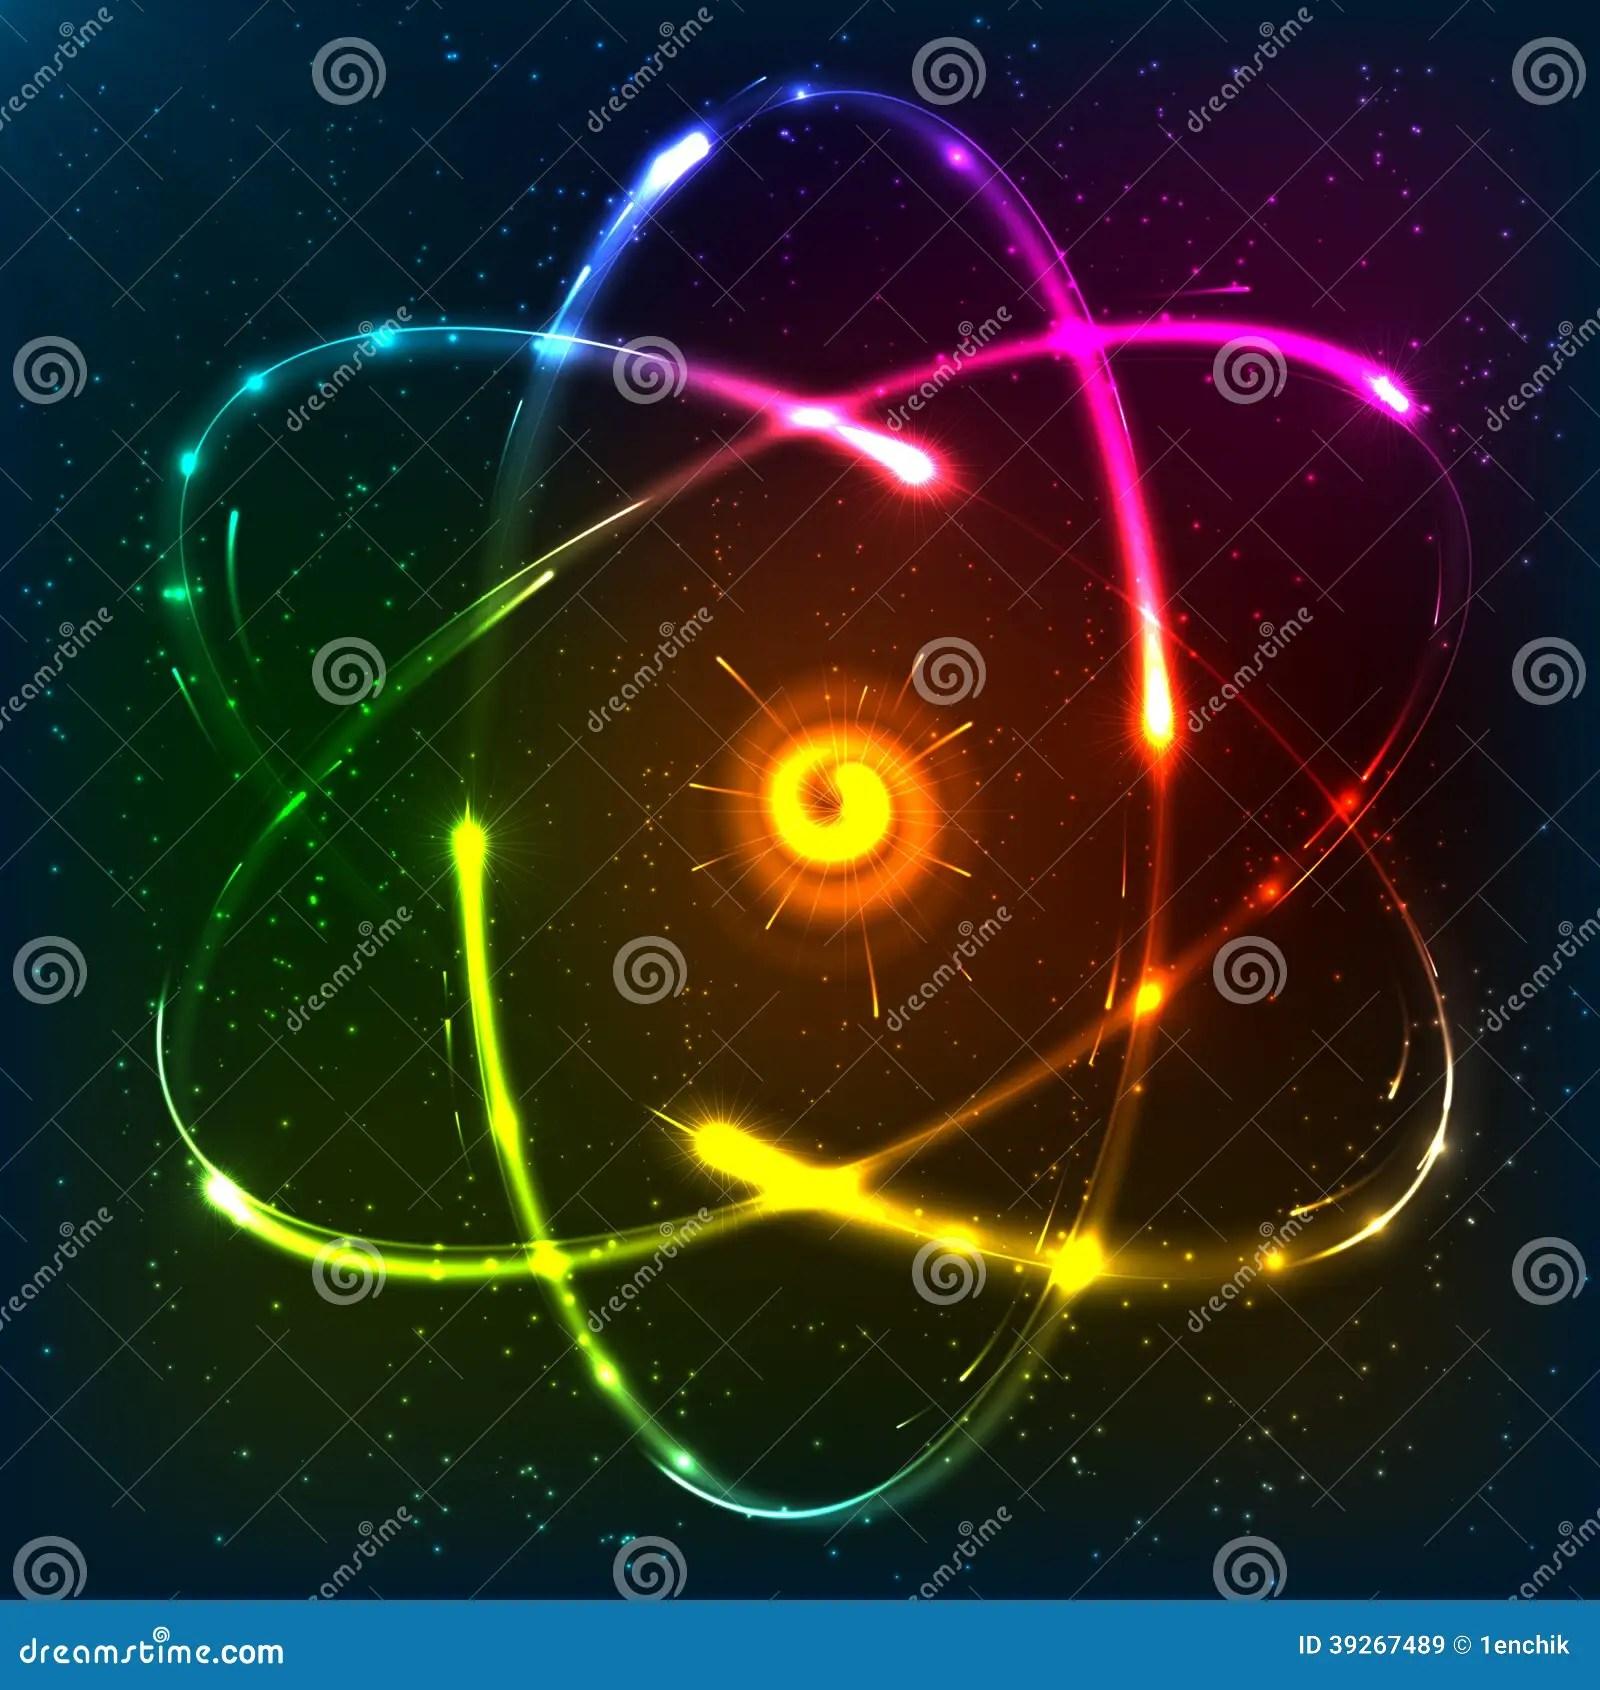 neon atom diagram cat 6 wiring for wall plates uk shining model vector illustration stock